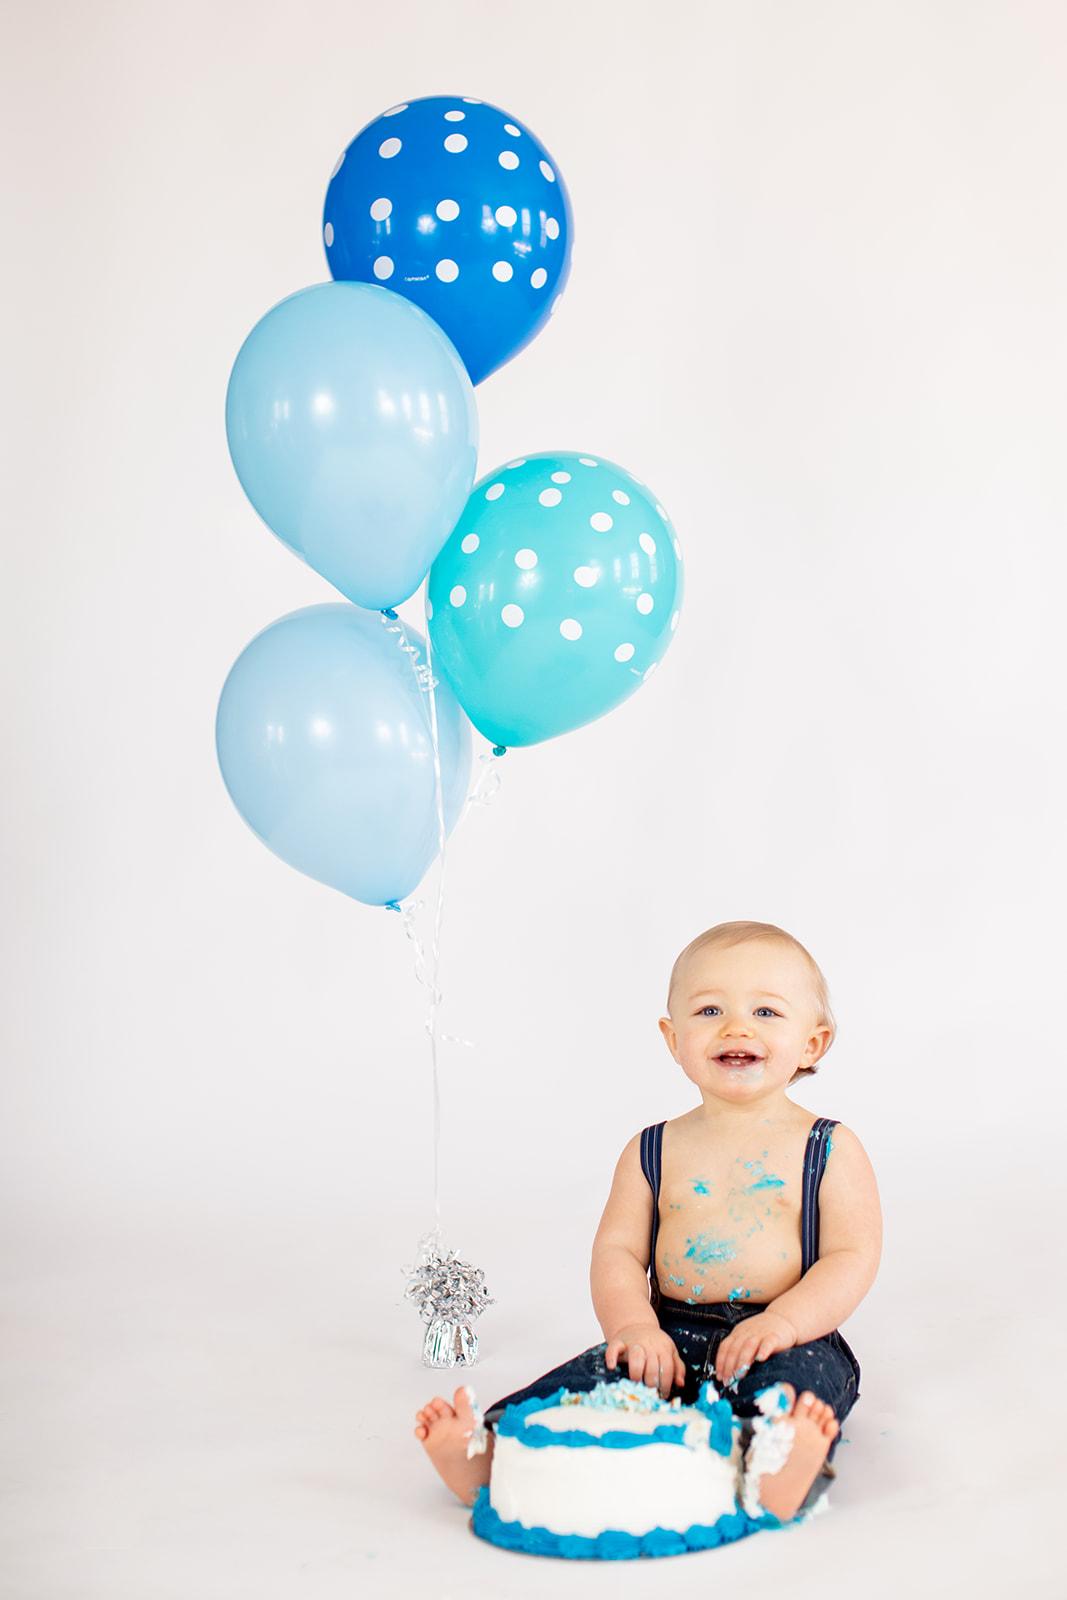 Sensational One Year Old Baby Boy Cake Smash Jd Studio 20 20 Jd Photo Funny Birthday Cards Online Inifodamsfinfo